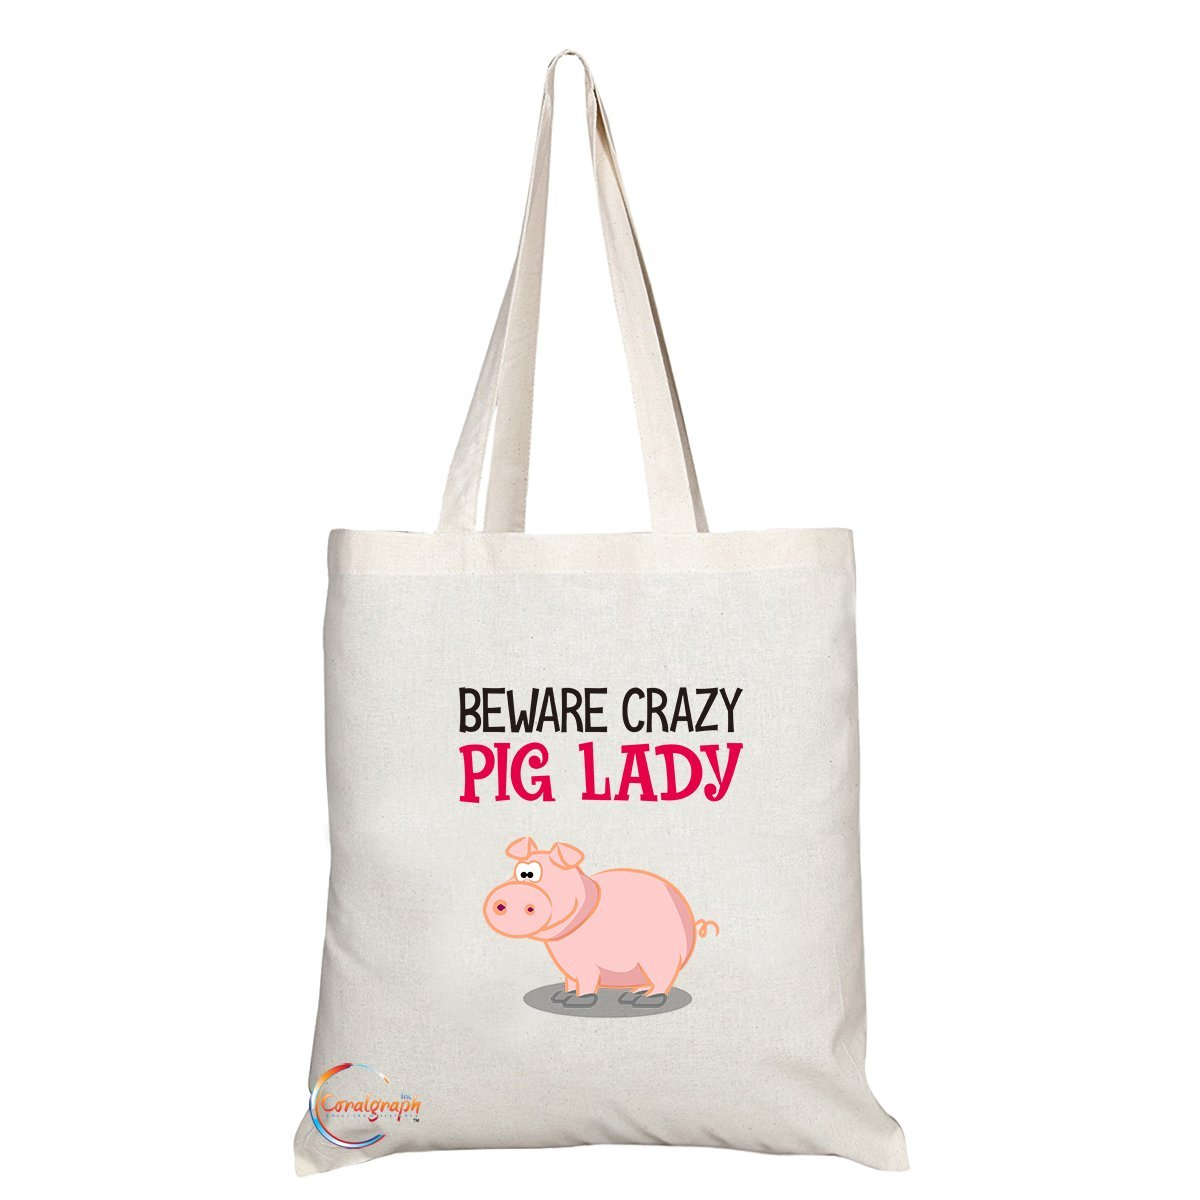 TB233 Beware Crazy Pig Lady Novelty Present Gift Printed Eco-Friendly Stylish Long Handled Tote Shoulder Bag Coralgraph Inc